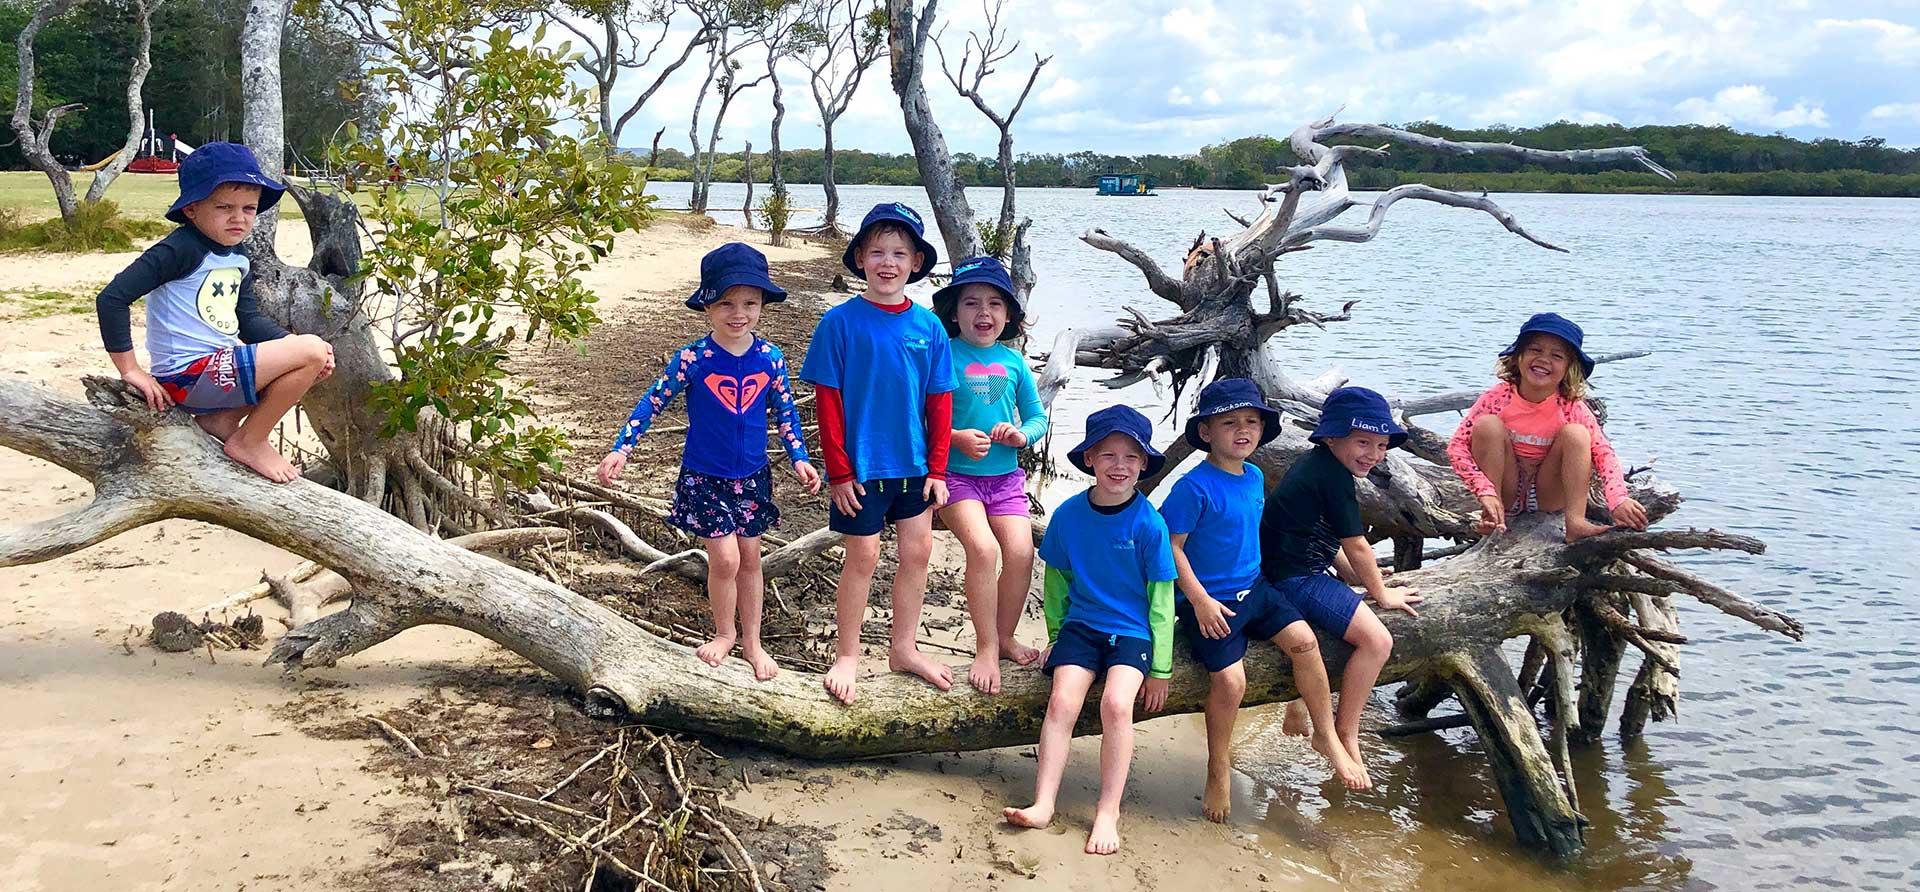 Beach Kindy - a group of Suncoast Little Learners on log at beach on Chambers Island